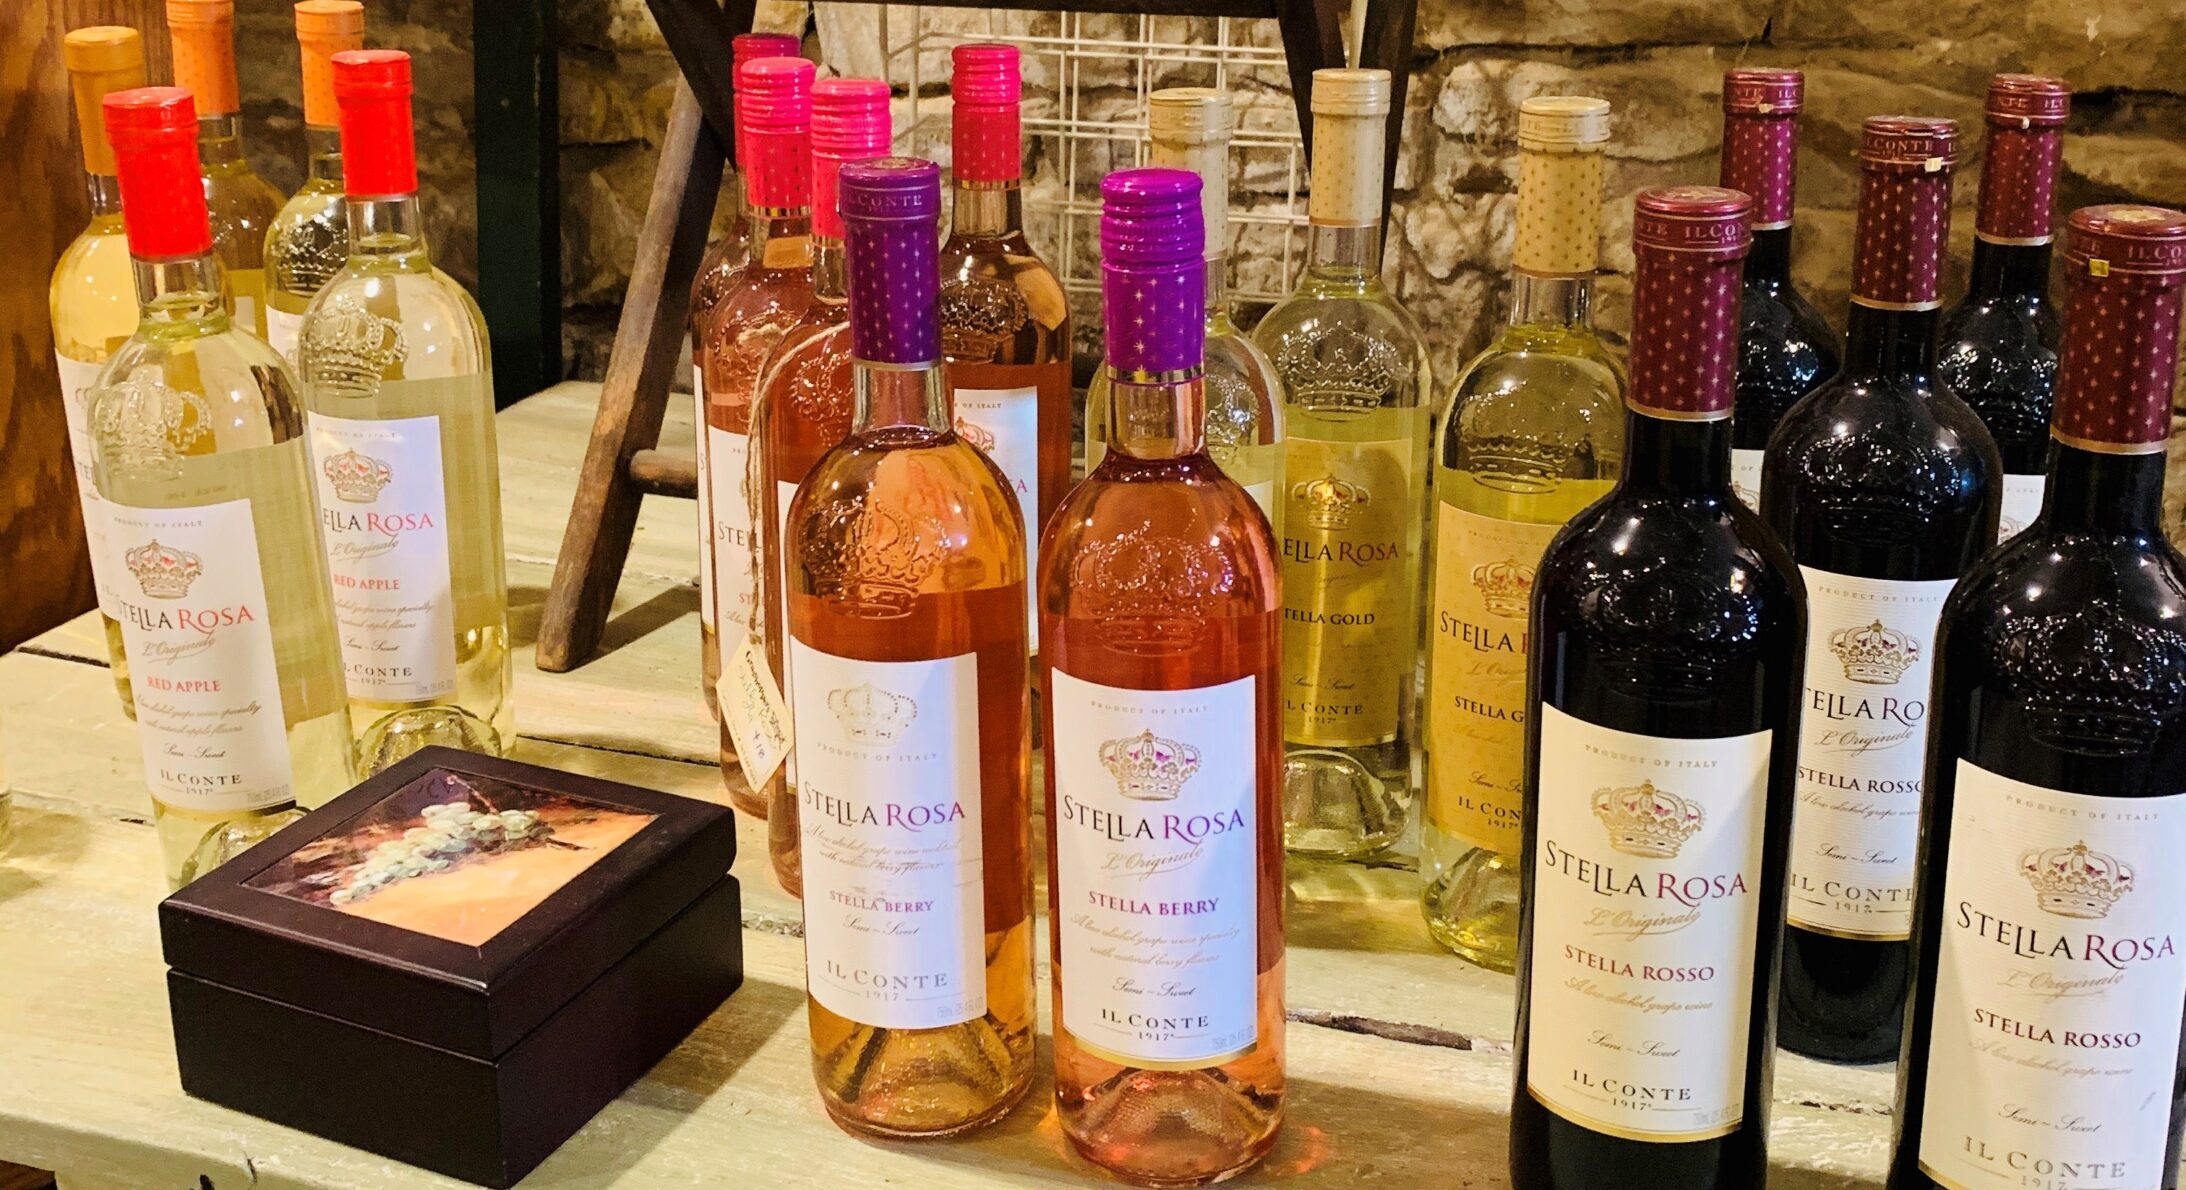 Stella Rosa wine on a table